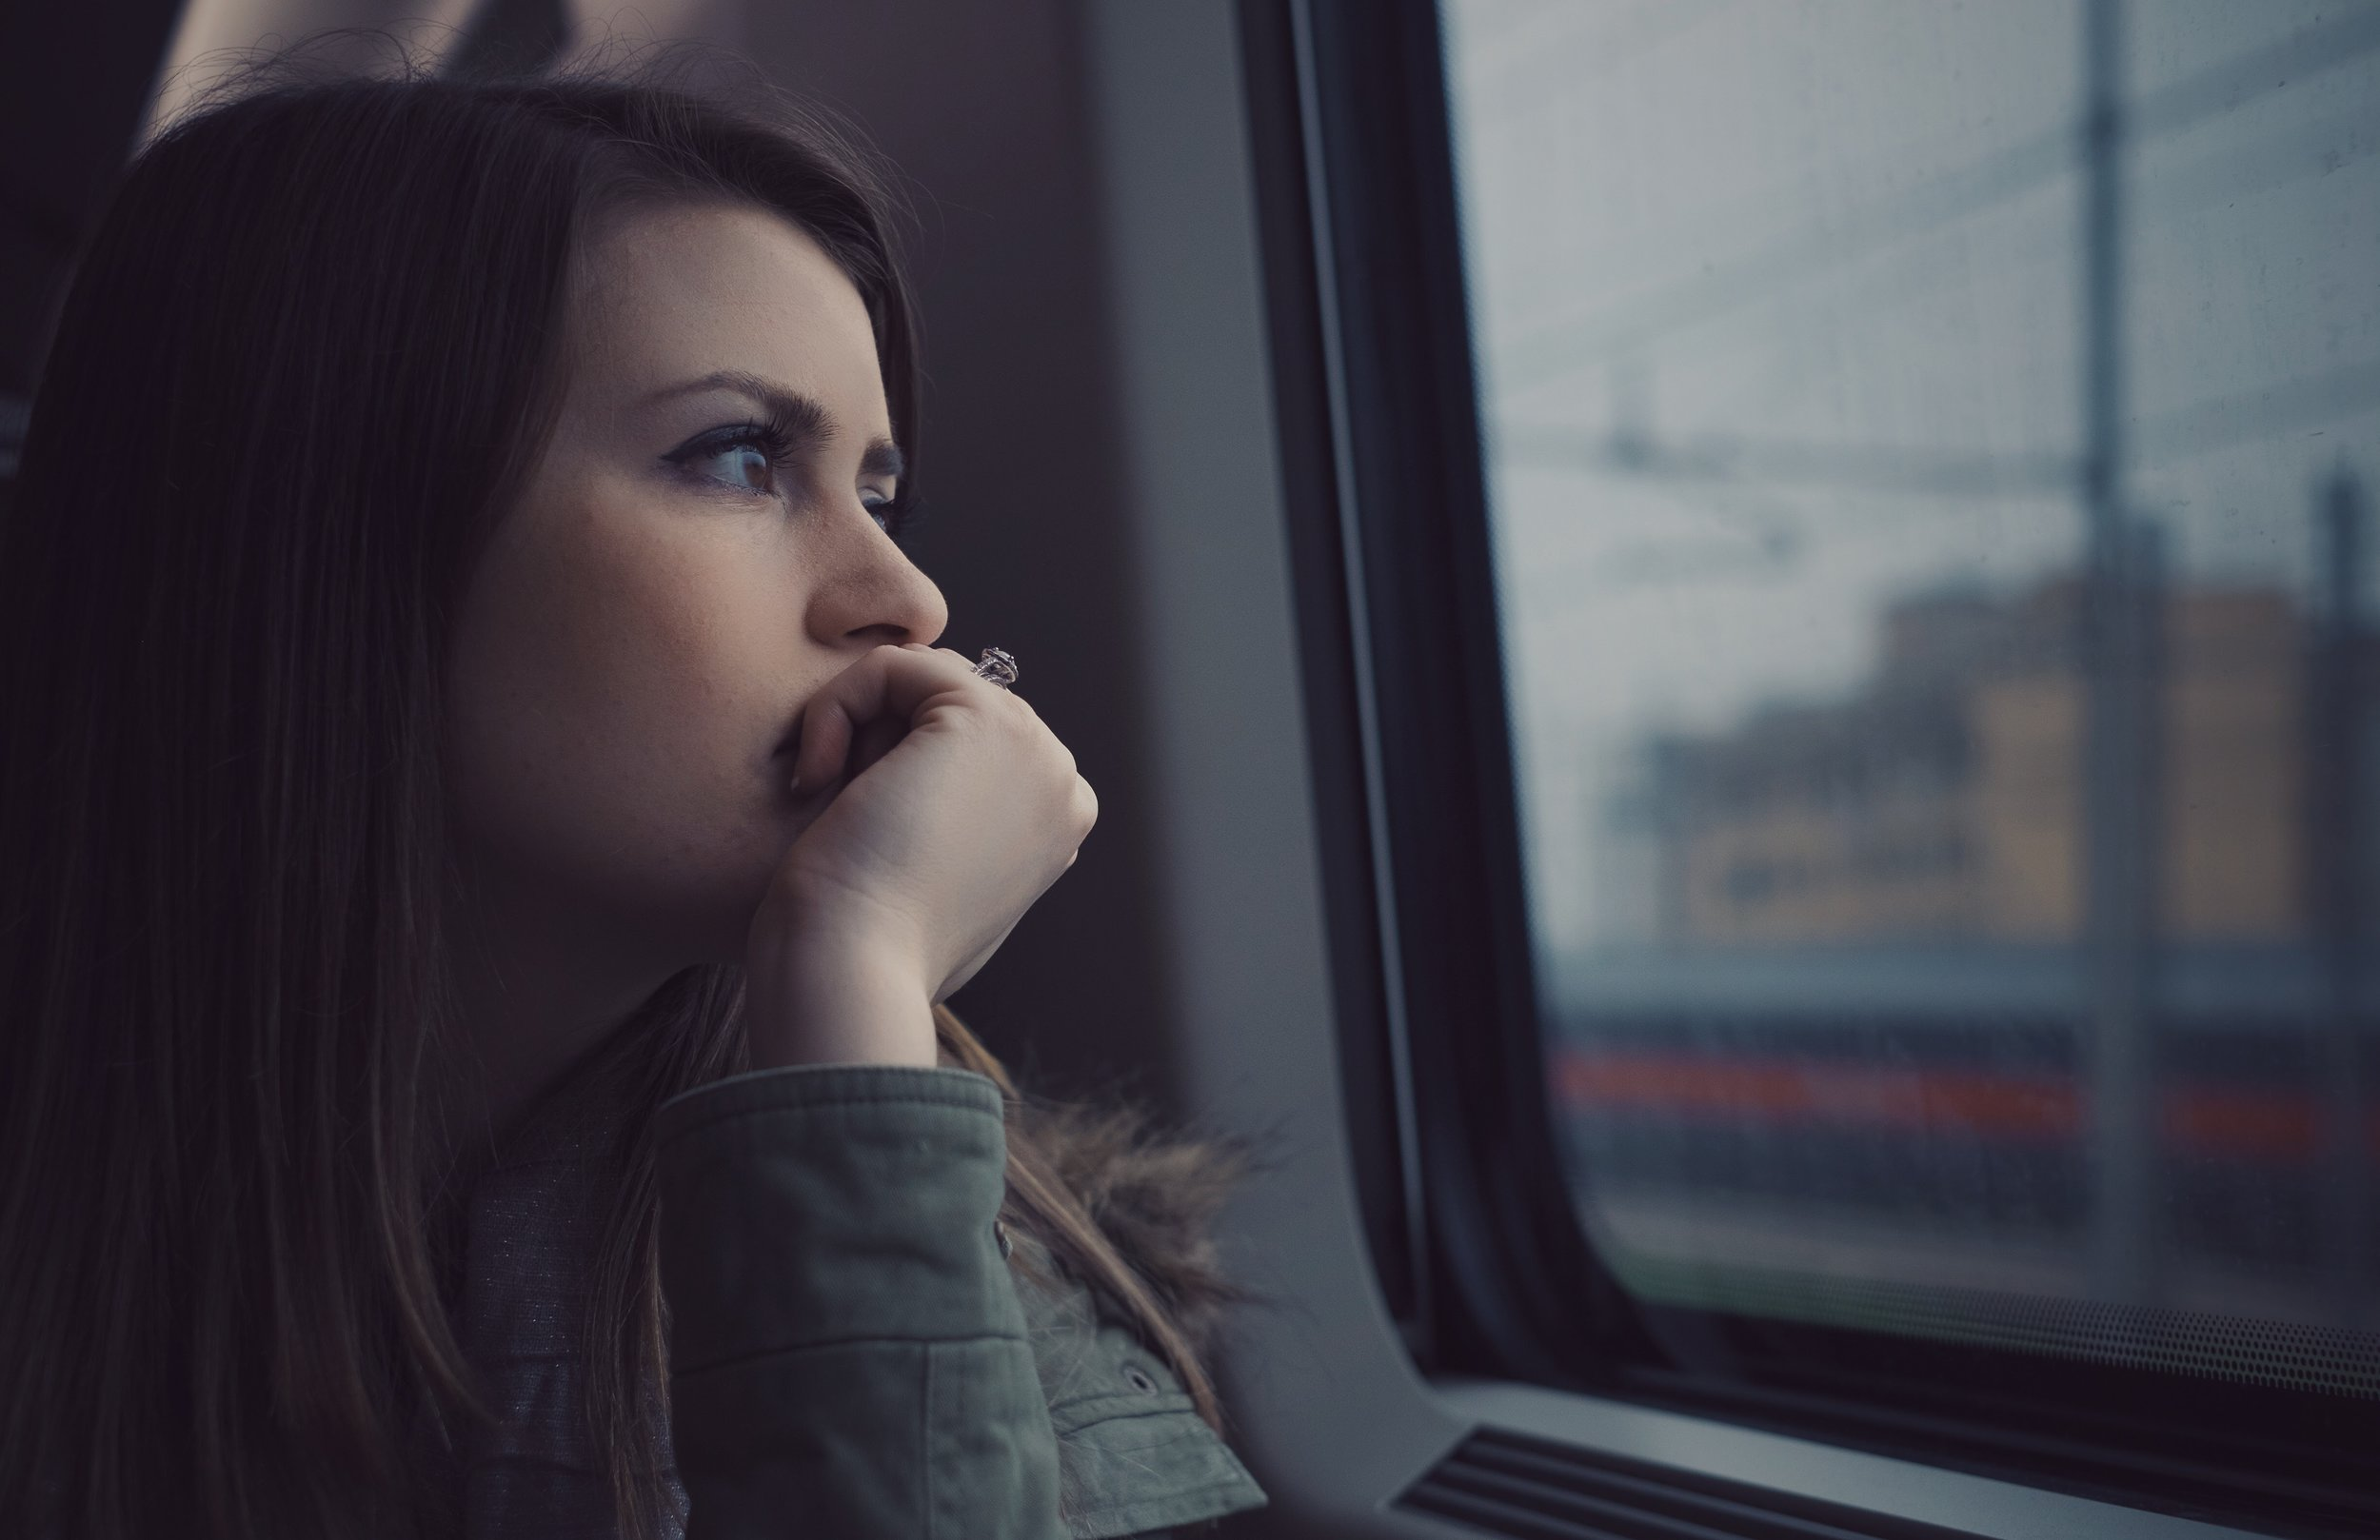 depressed lady.jpg